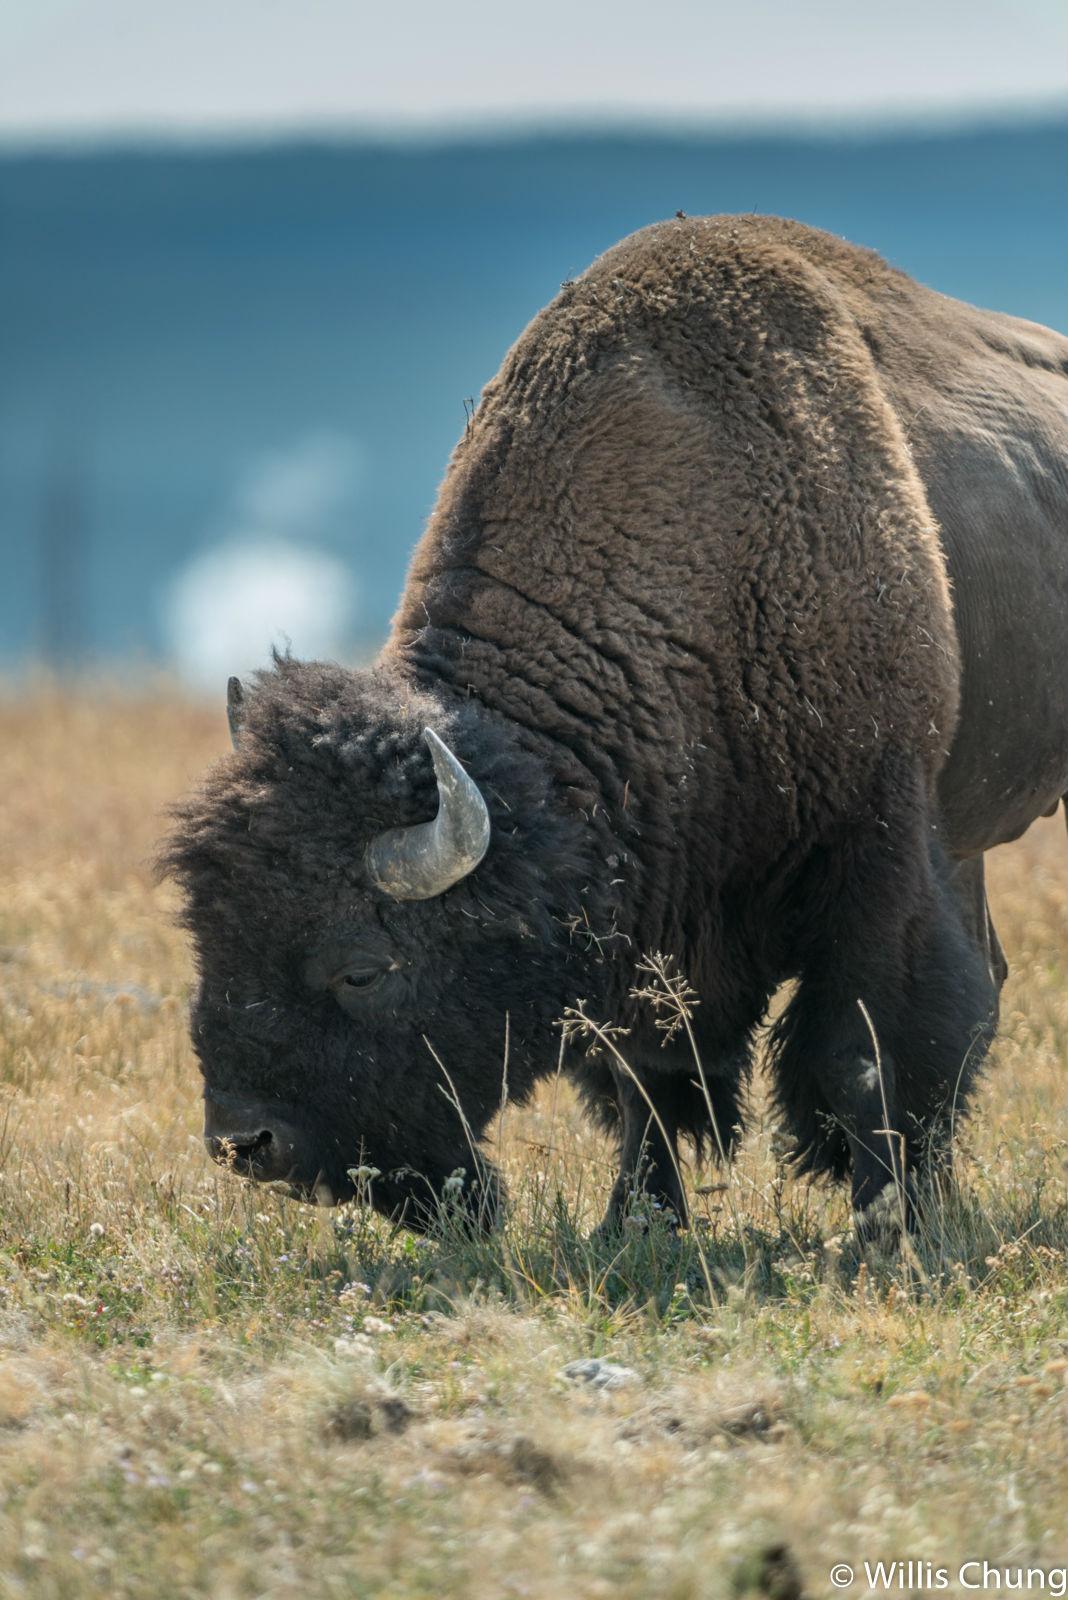 Chung Yellowstone Bull 3 image